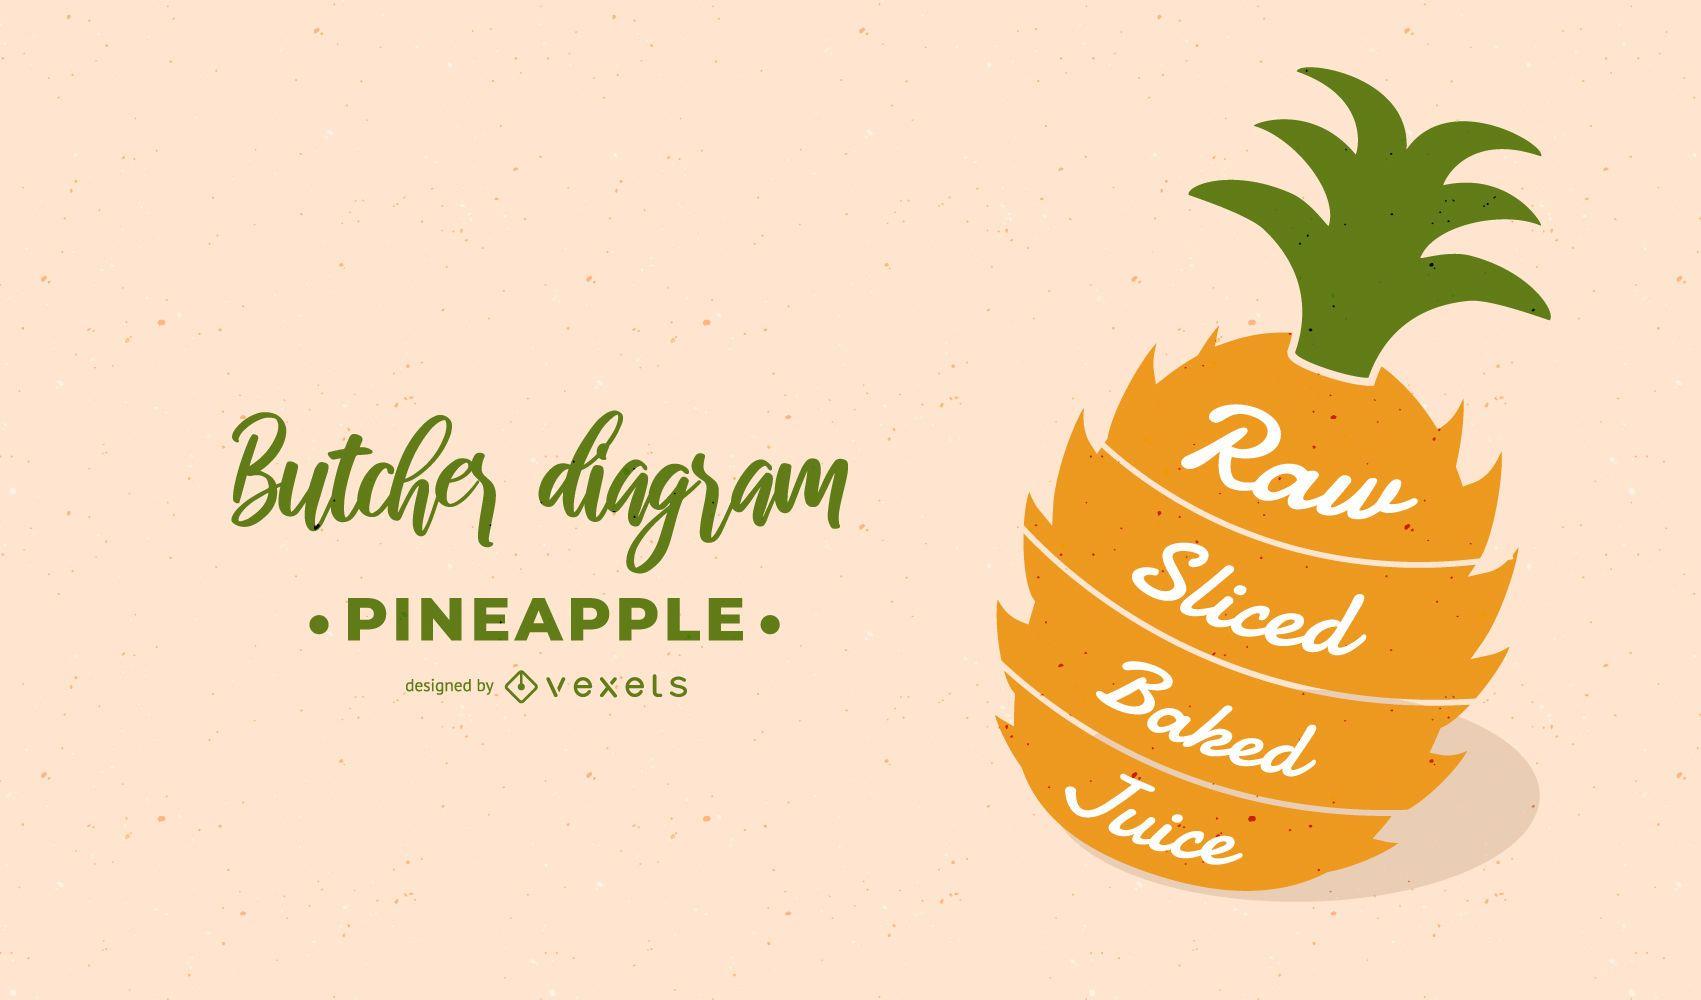 Pineapple Butcher Diagram Design